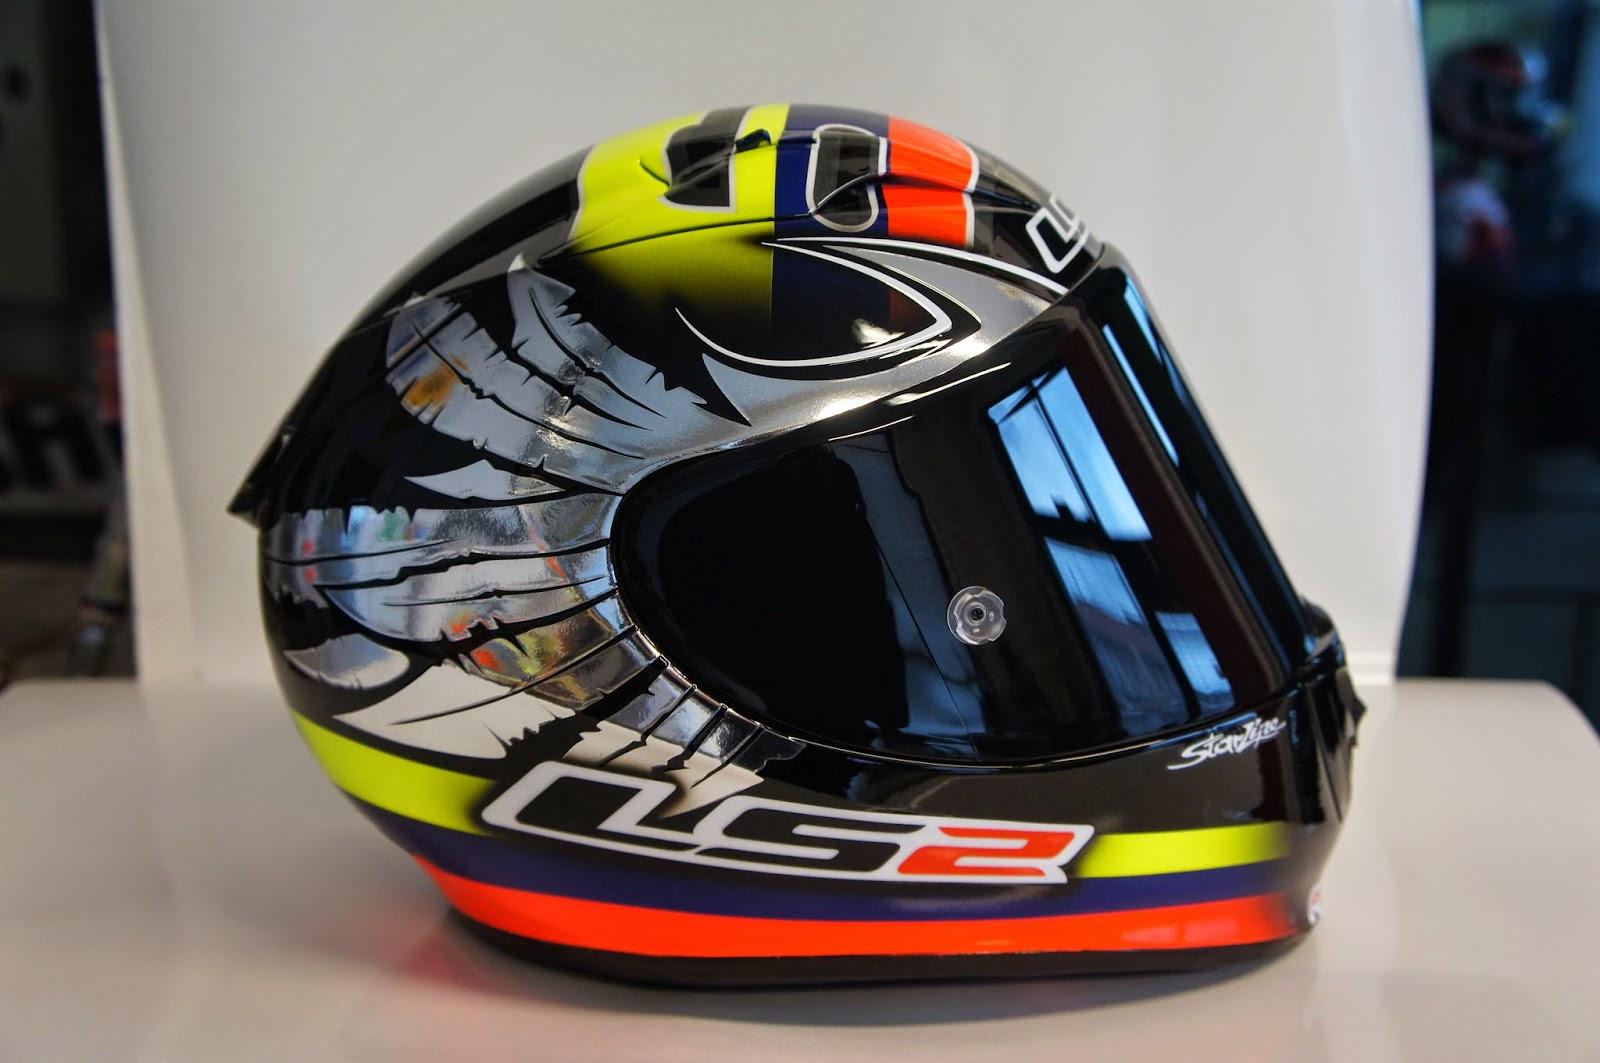 racing helmets garage ls2 ff323 arrow r y hernandez. Black Bedroom Furniture Sets. Home Design Ideas